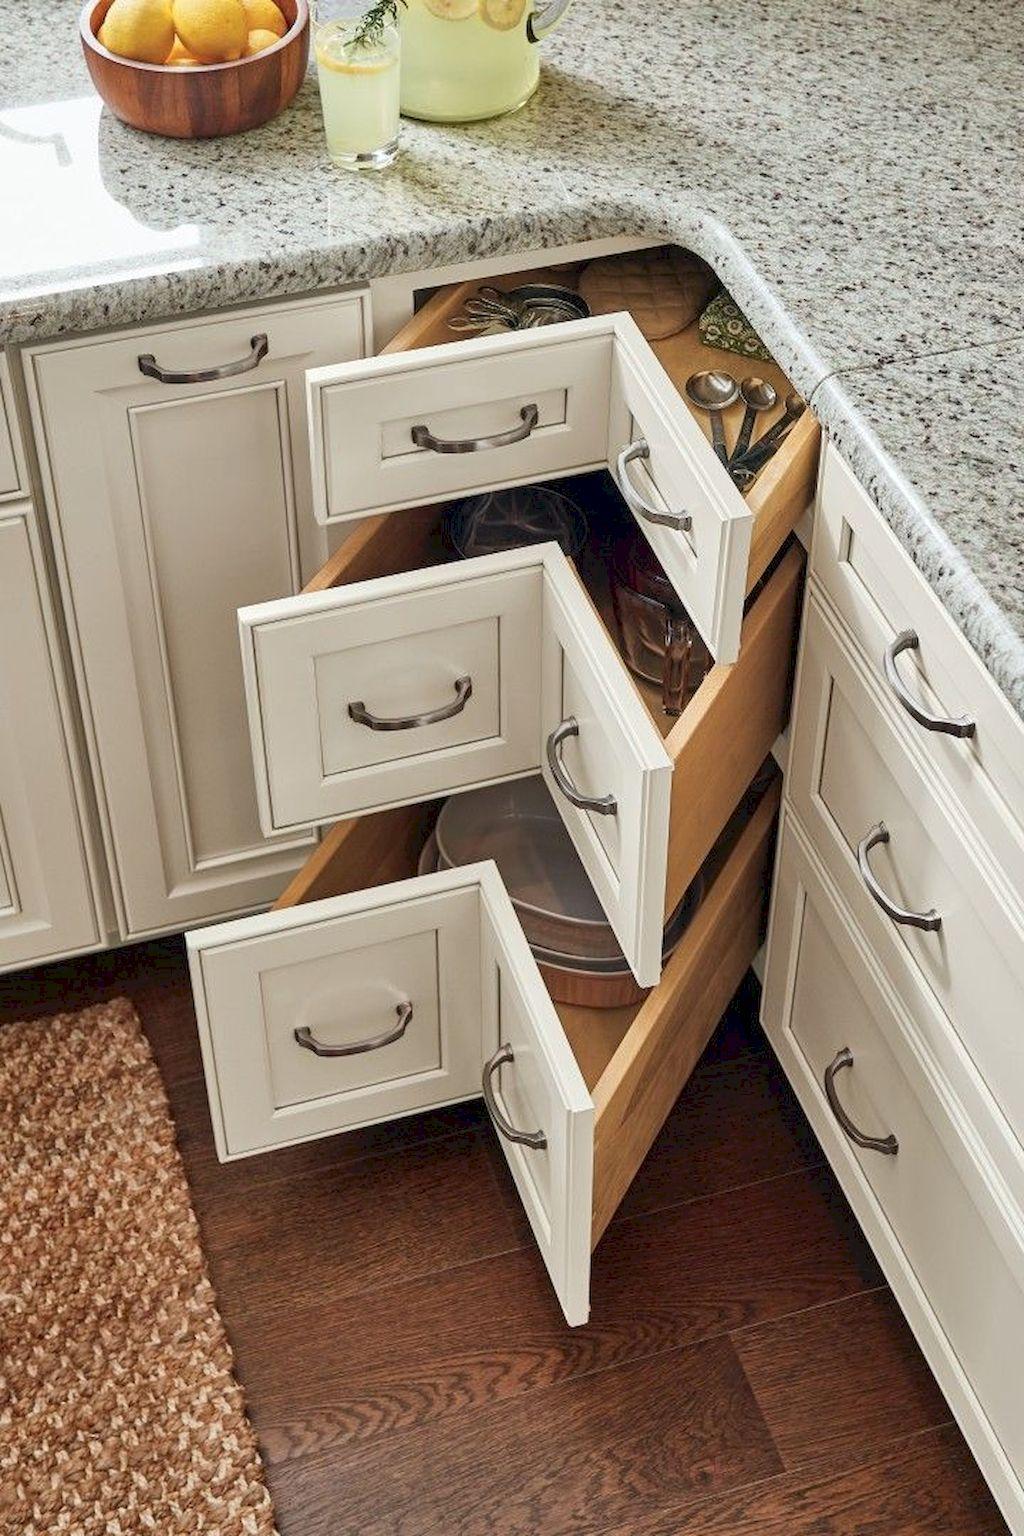 Gorgeous Kitchen Cupboard Concepts Nebolshoe Peremodelirovanie Kuhni Plany Kuhni Nebolshie Kuhni